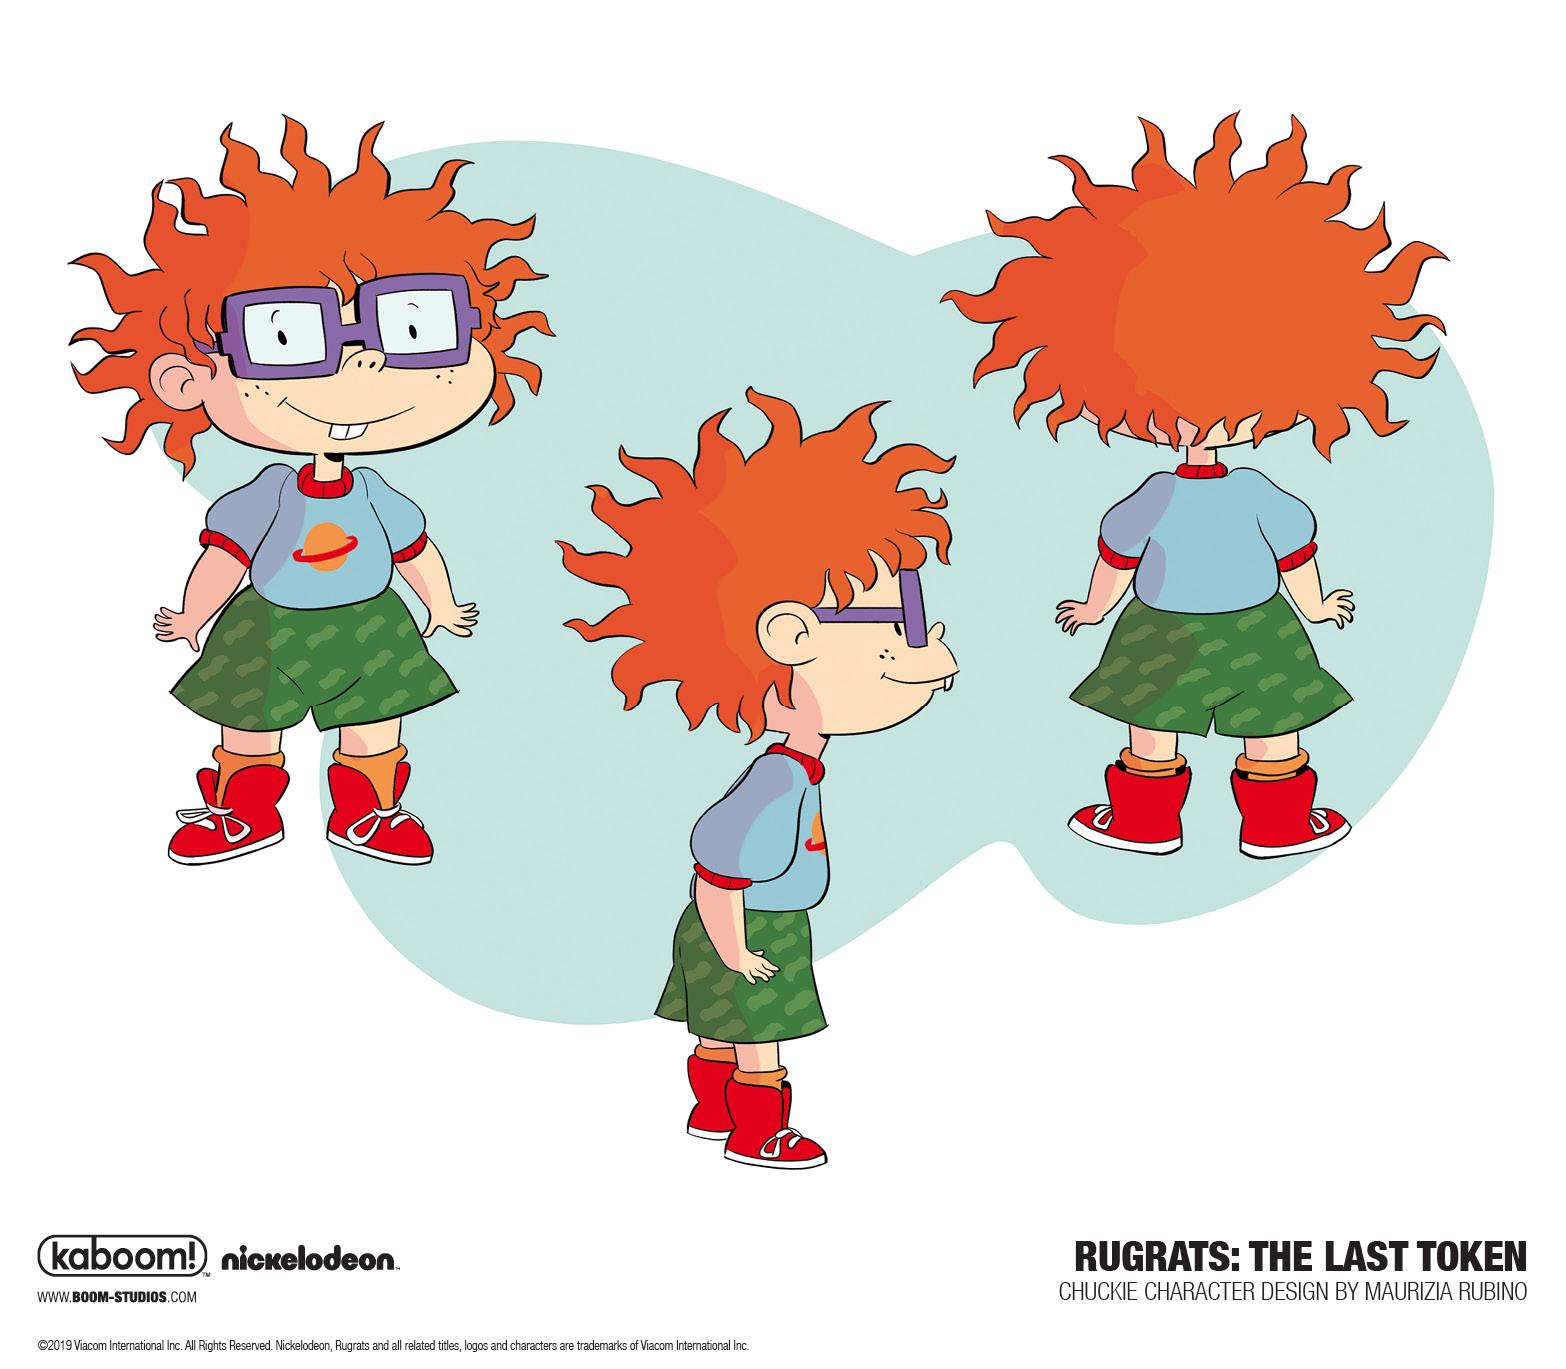 Rugrats_LastToken_CharaterDesign_Chuckie_PROMO.jpg